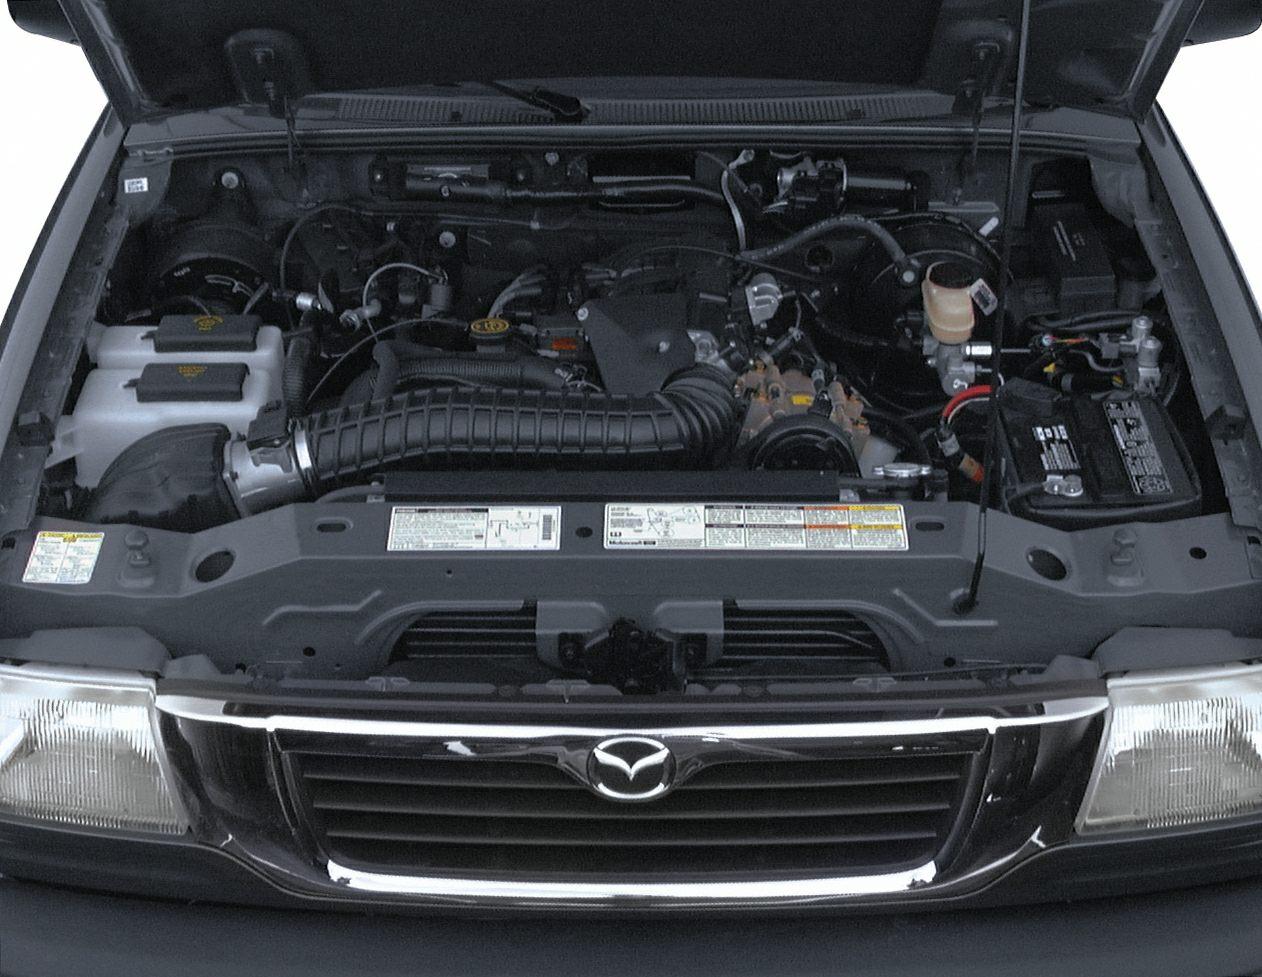 2000 Mazda B4000 Tl 4x4 Cab Plus 4 1259 In Wb Specs And Prices 2003 B3000 Engine Diagram Exterior Photo